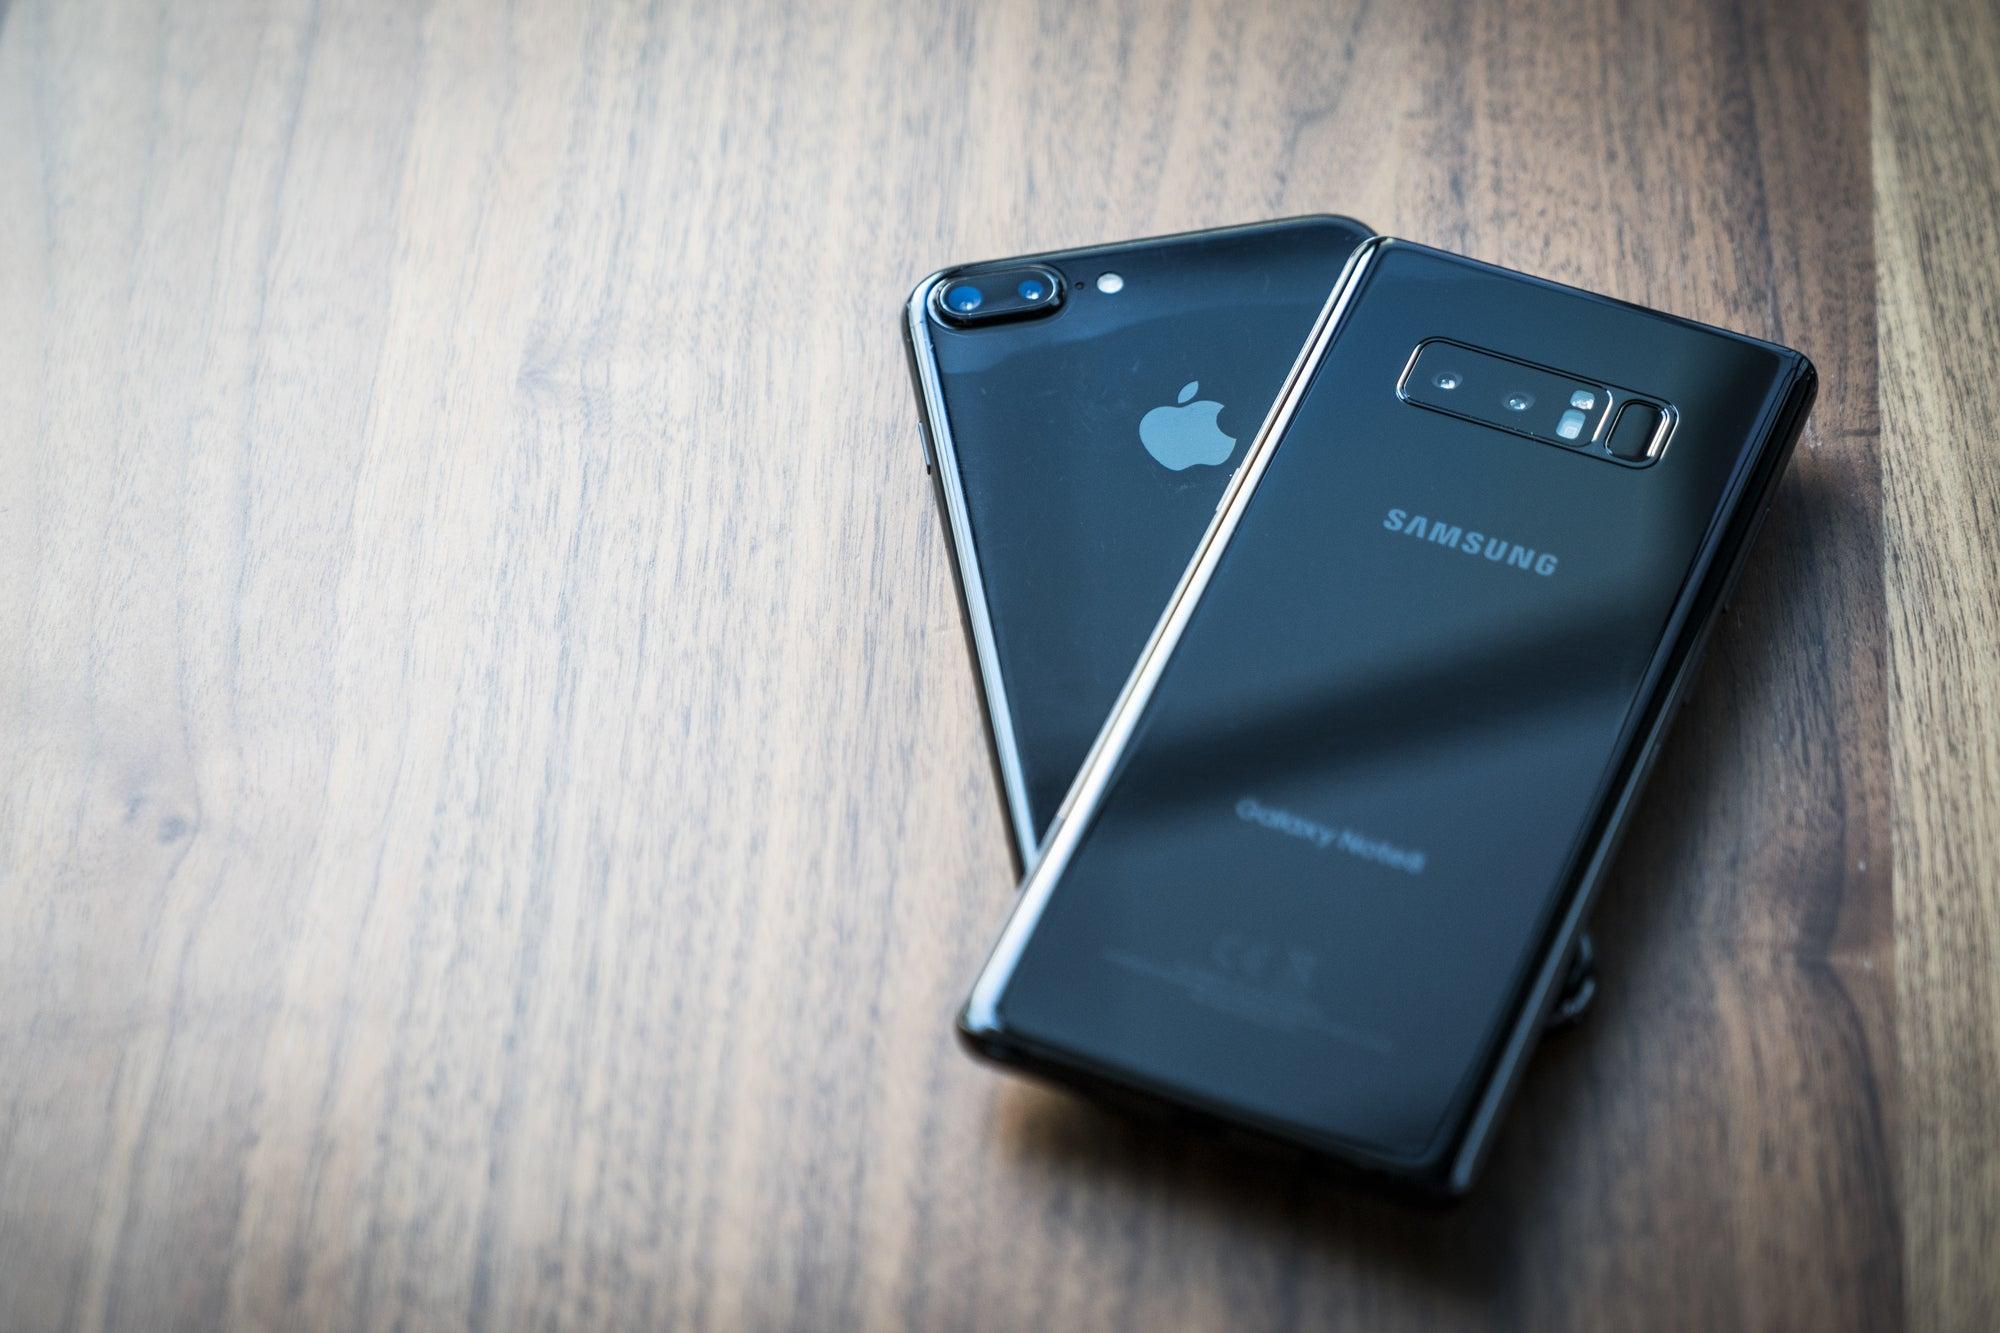 tested galaxy note 8 live focus vs iphone 7 plus portrait mode techconnect. Black Bedroom Furniture Sets. Home Design Ideas